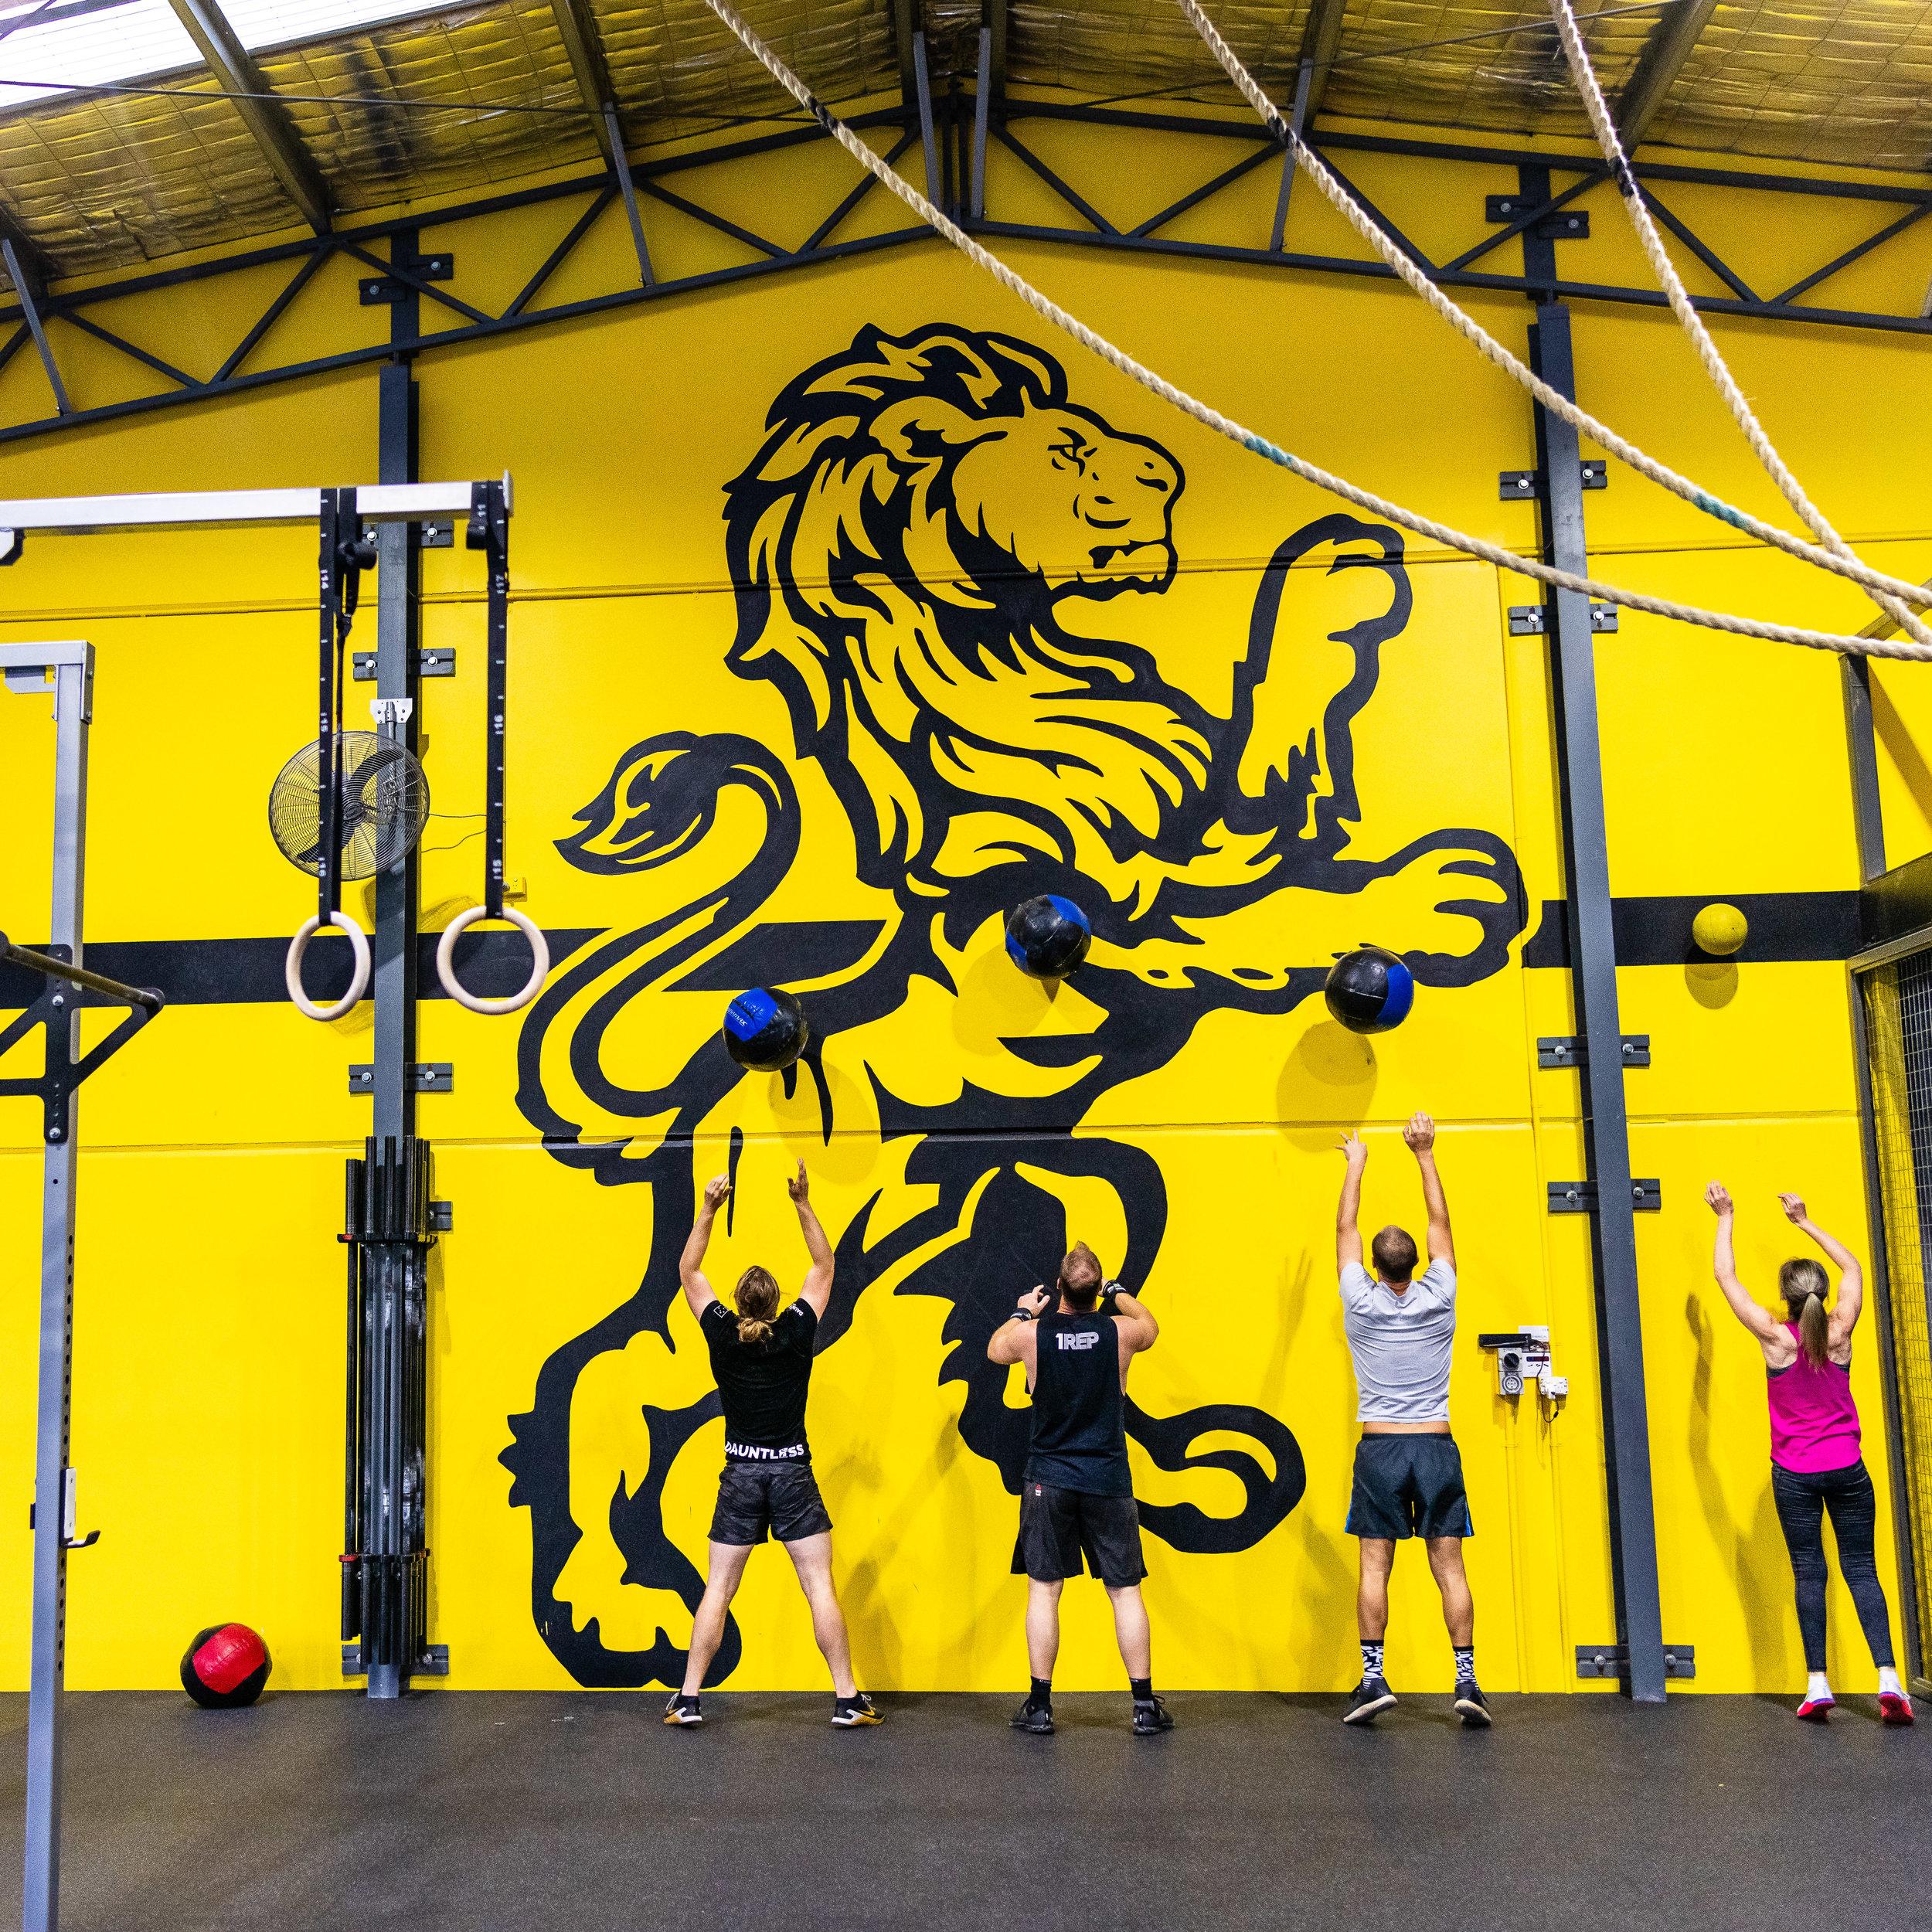 Dauntles_New _Gym-3.jpg